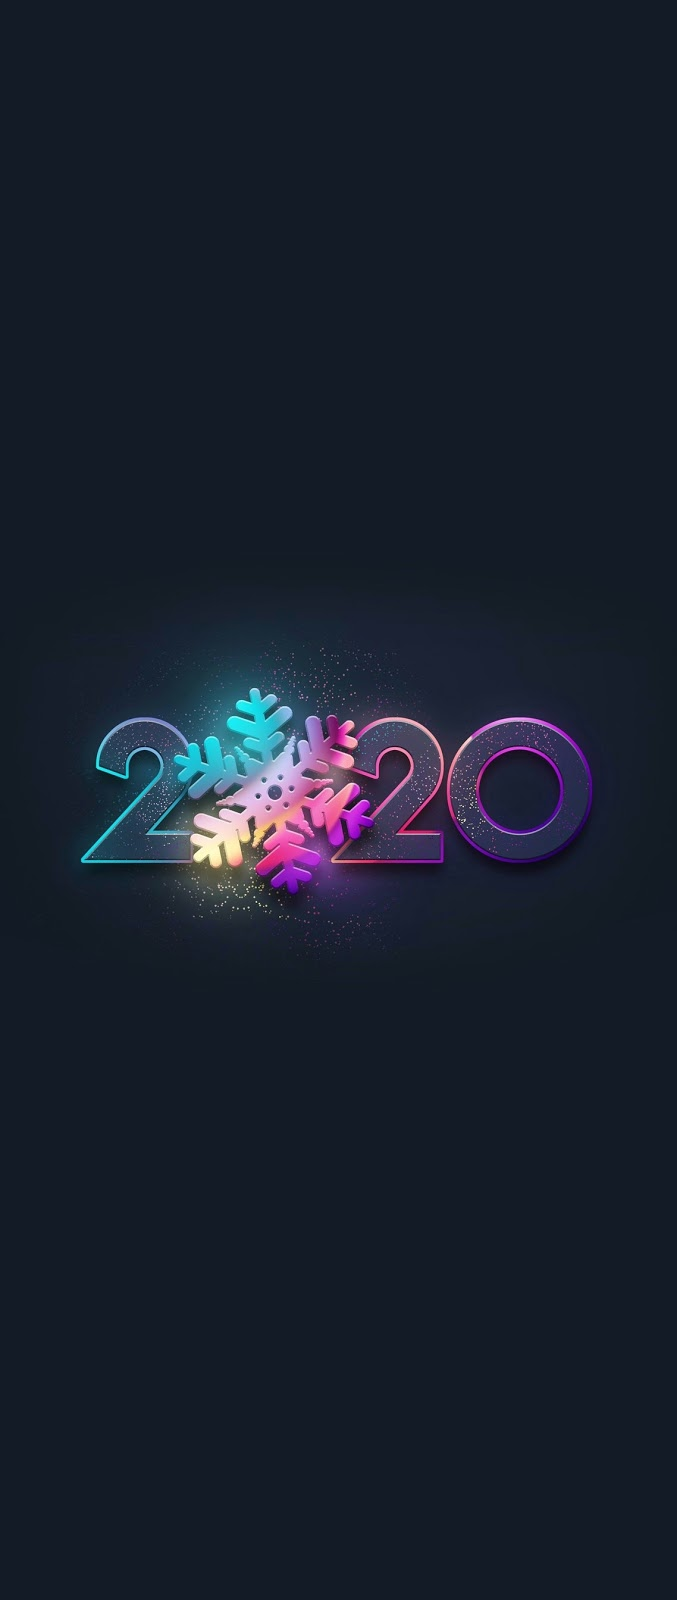 2020 Wallpaper